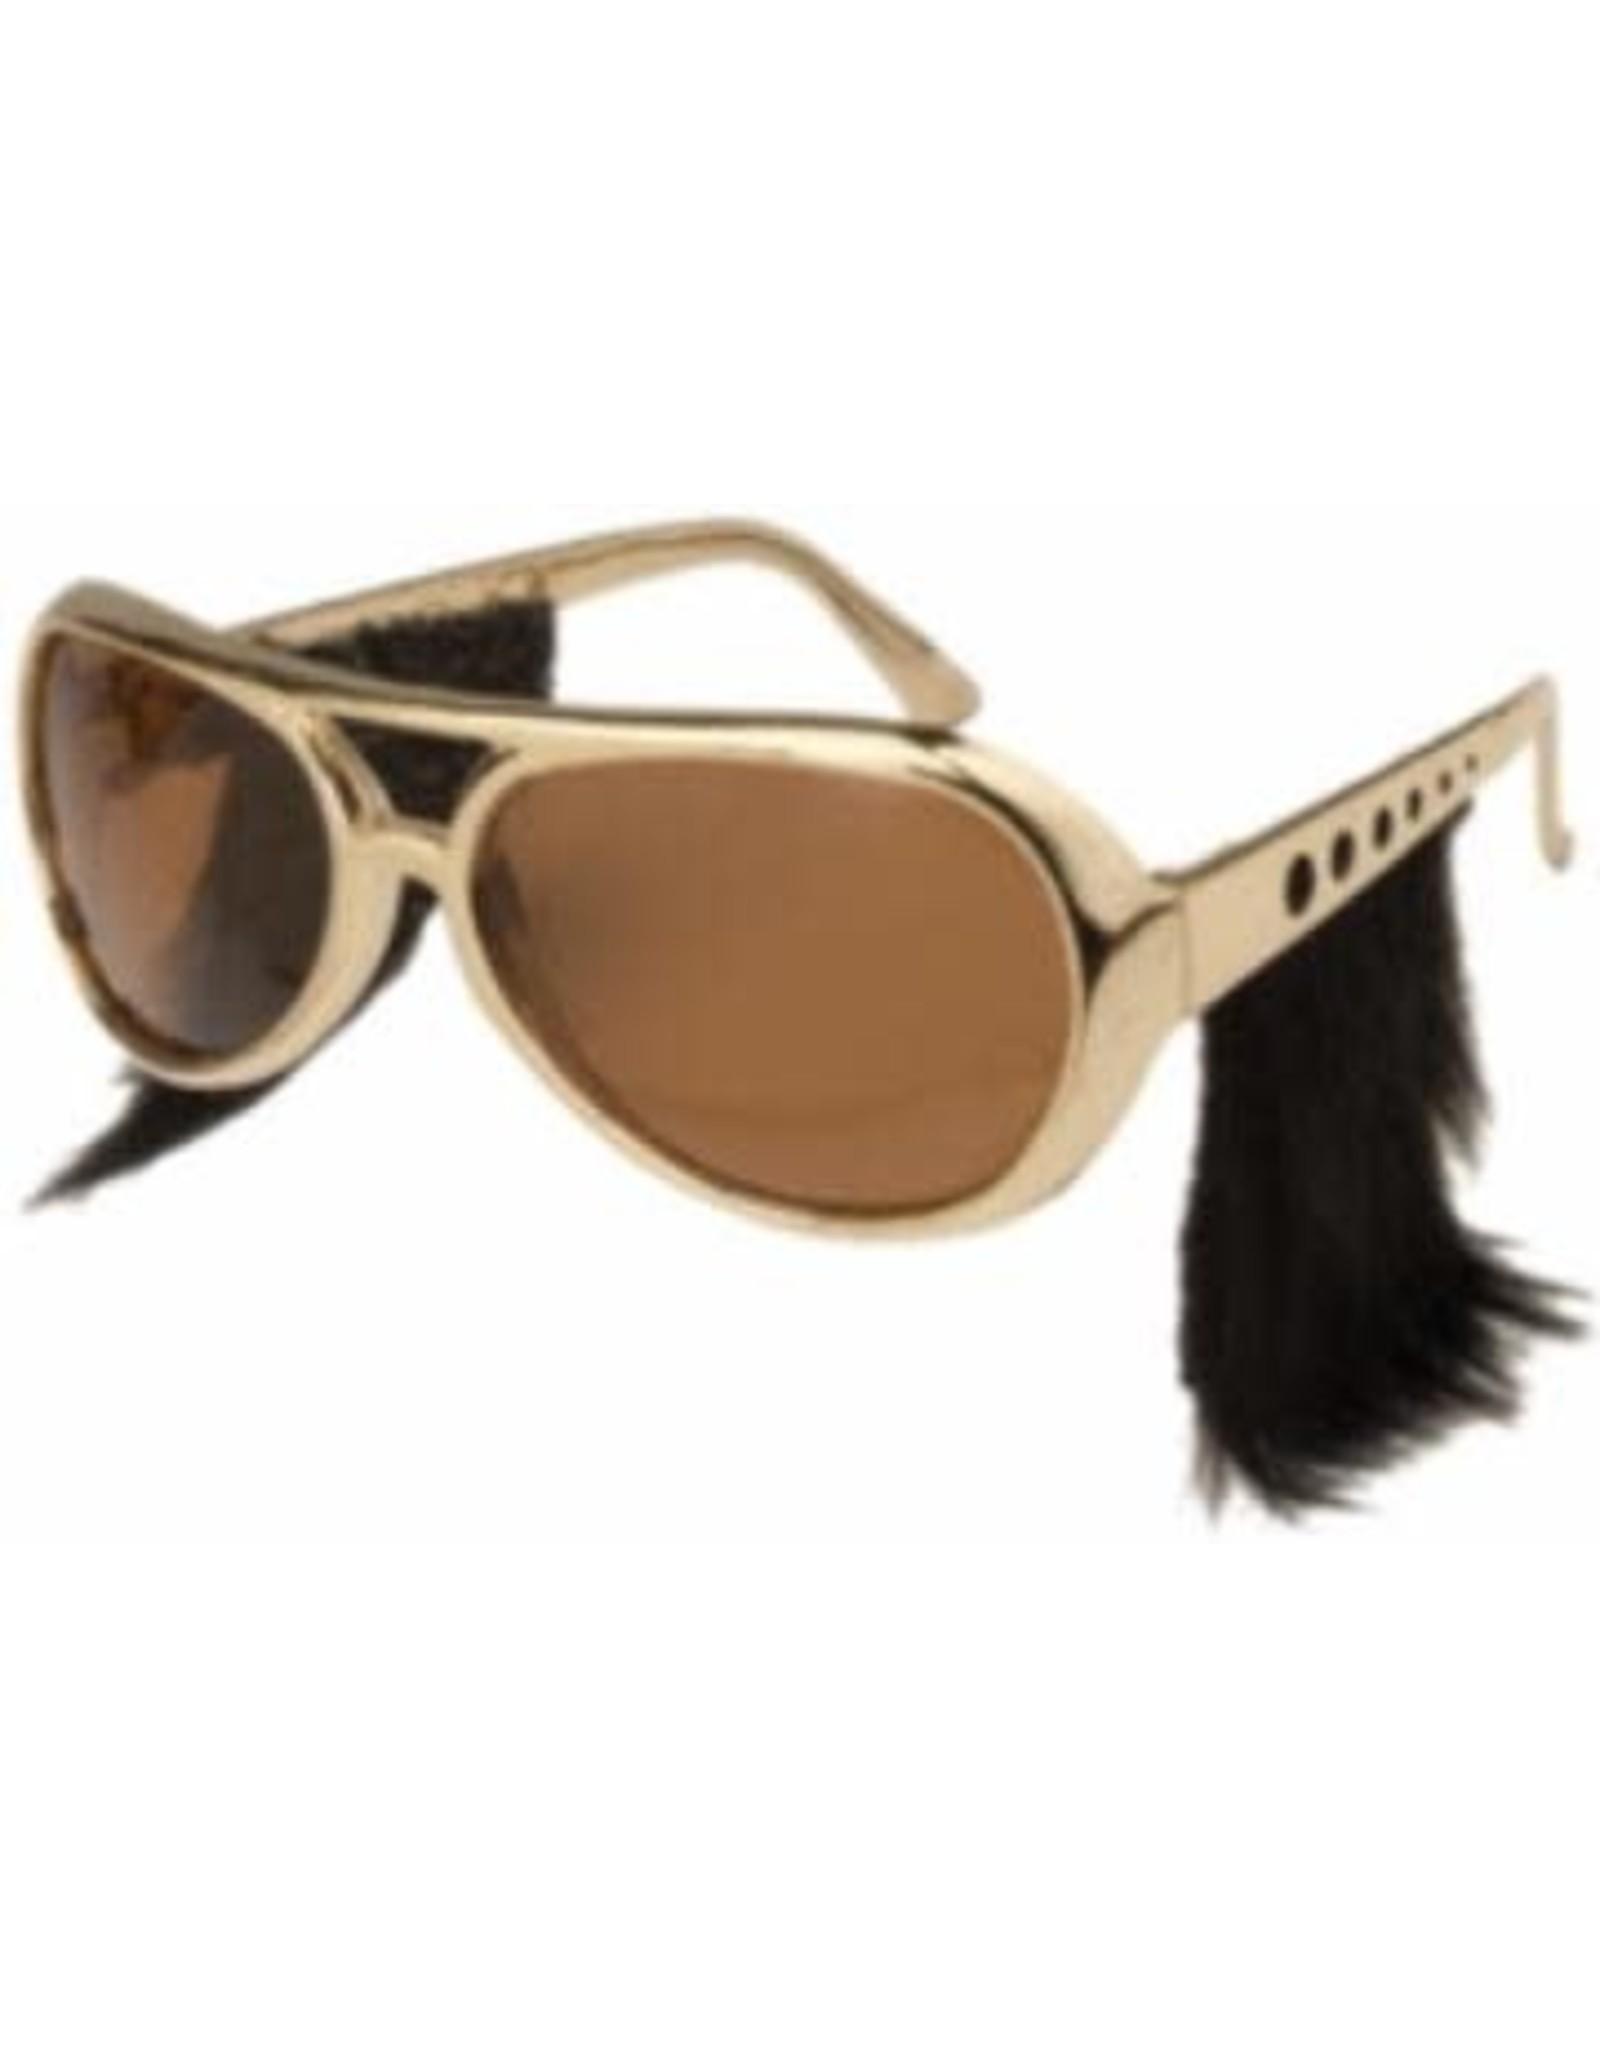 SKS Novelty Glasses w/Sideburns